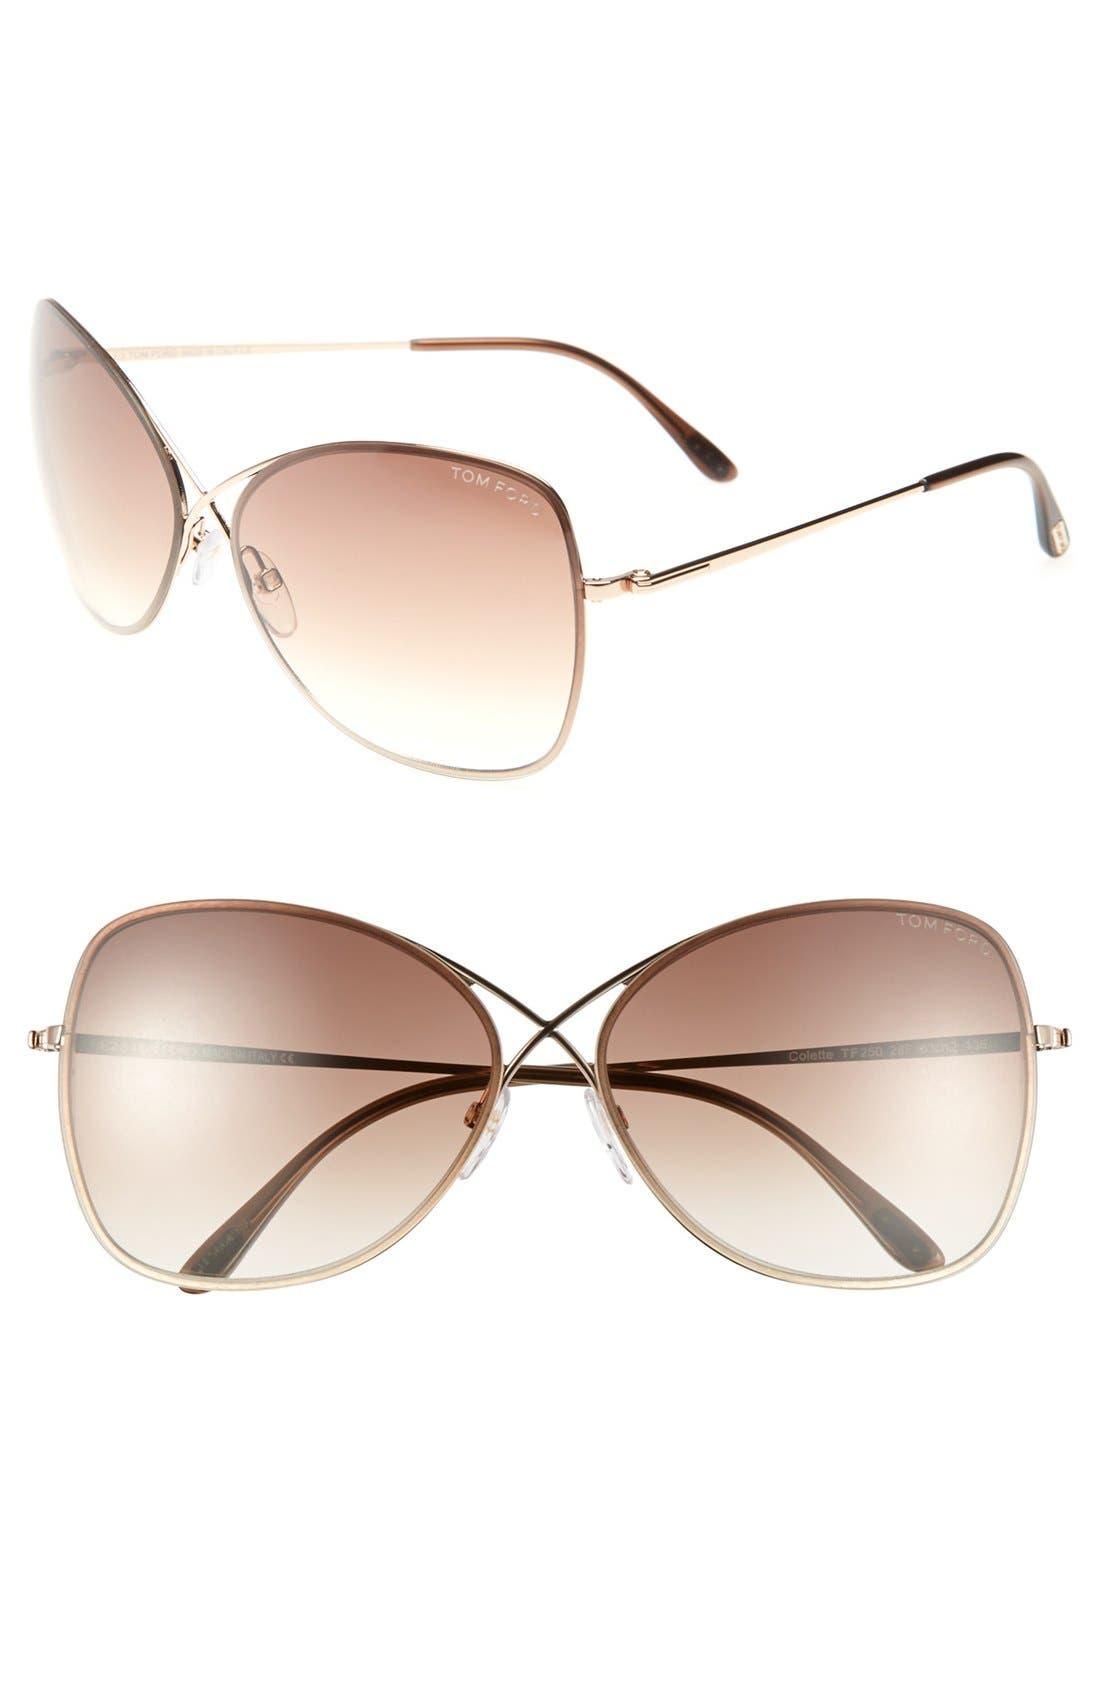 TOM FORD 'Colette' 63mm Oversize Sunglasses, Main, color, SHINY ROSE GOLD/ DARK BROWN